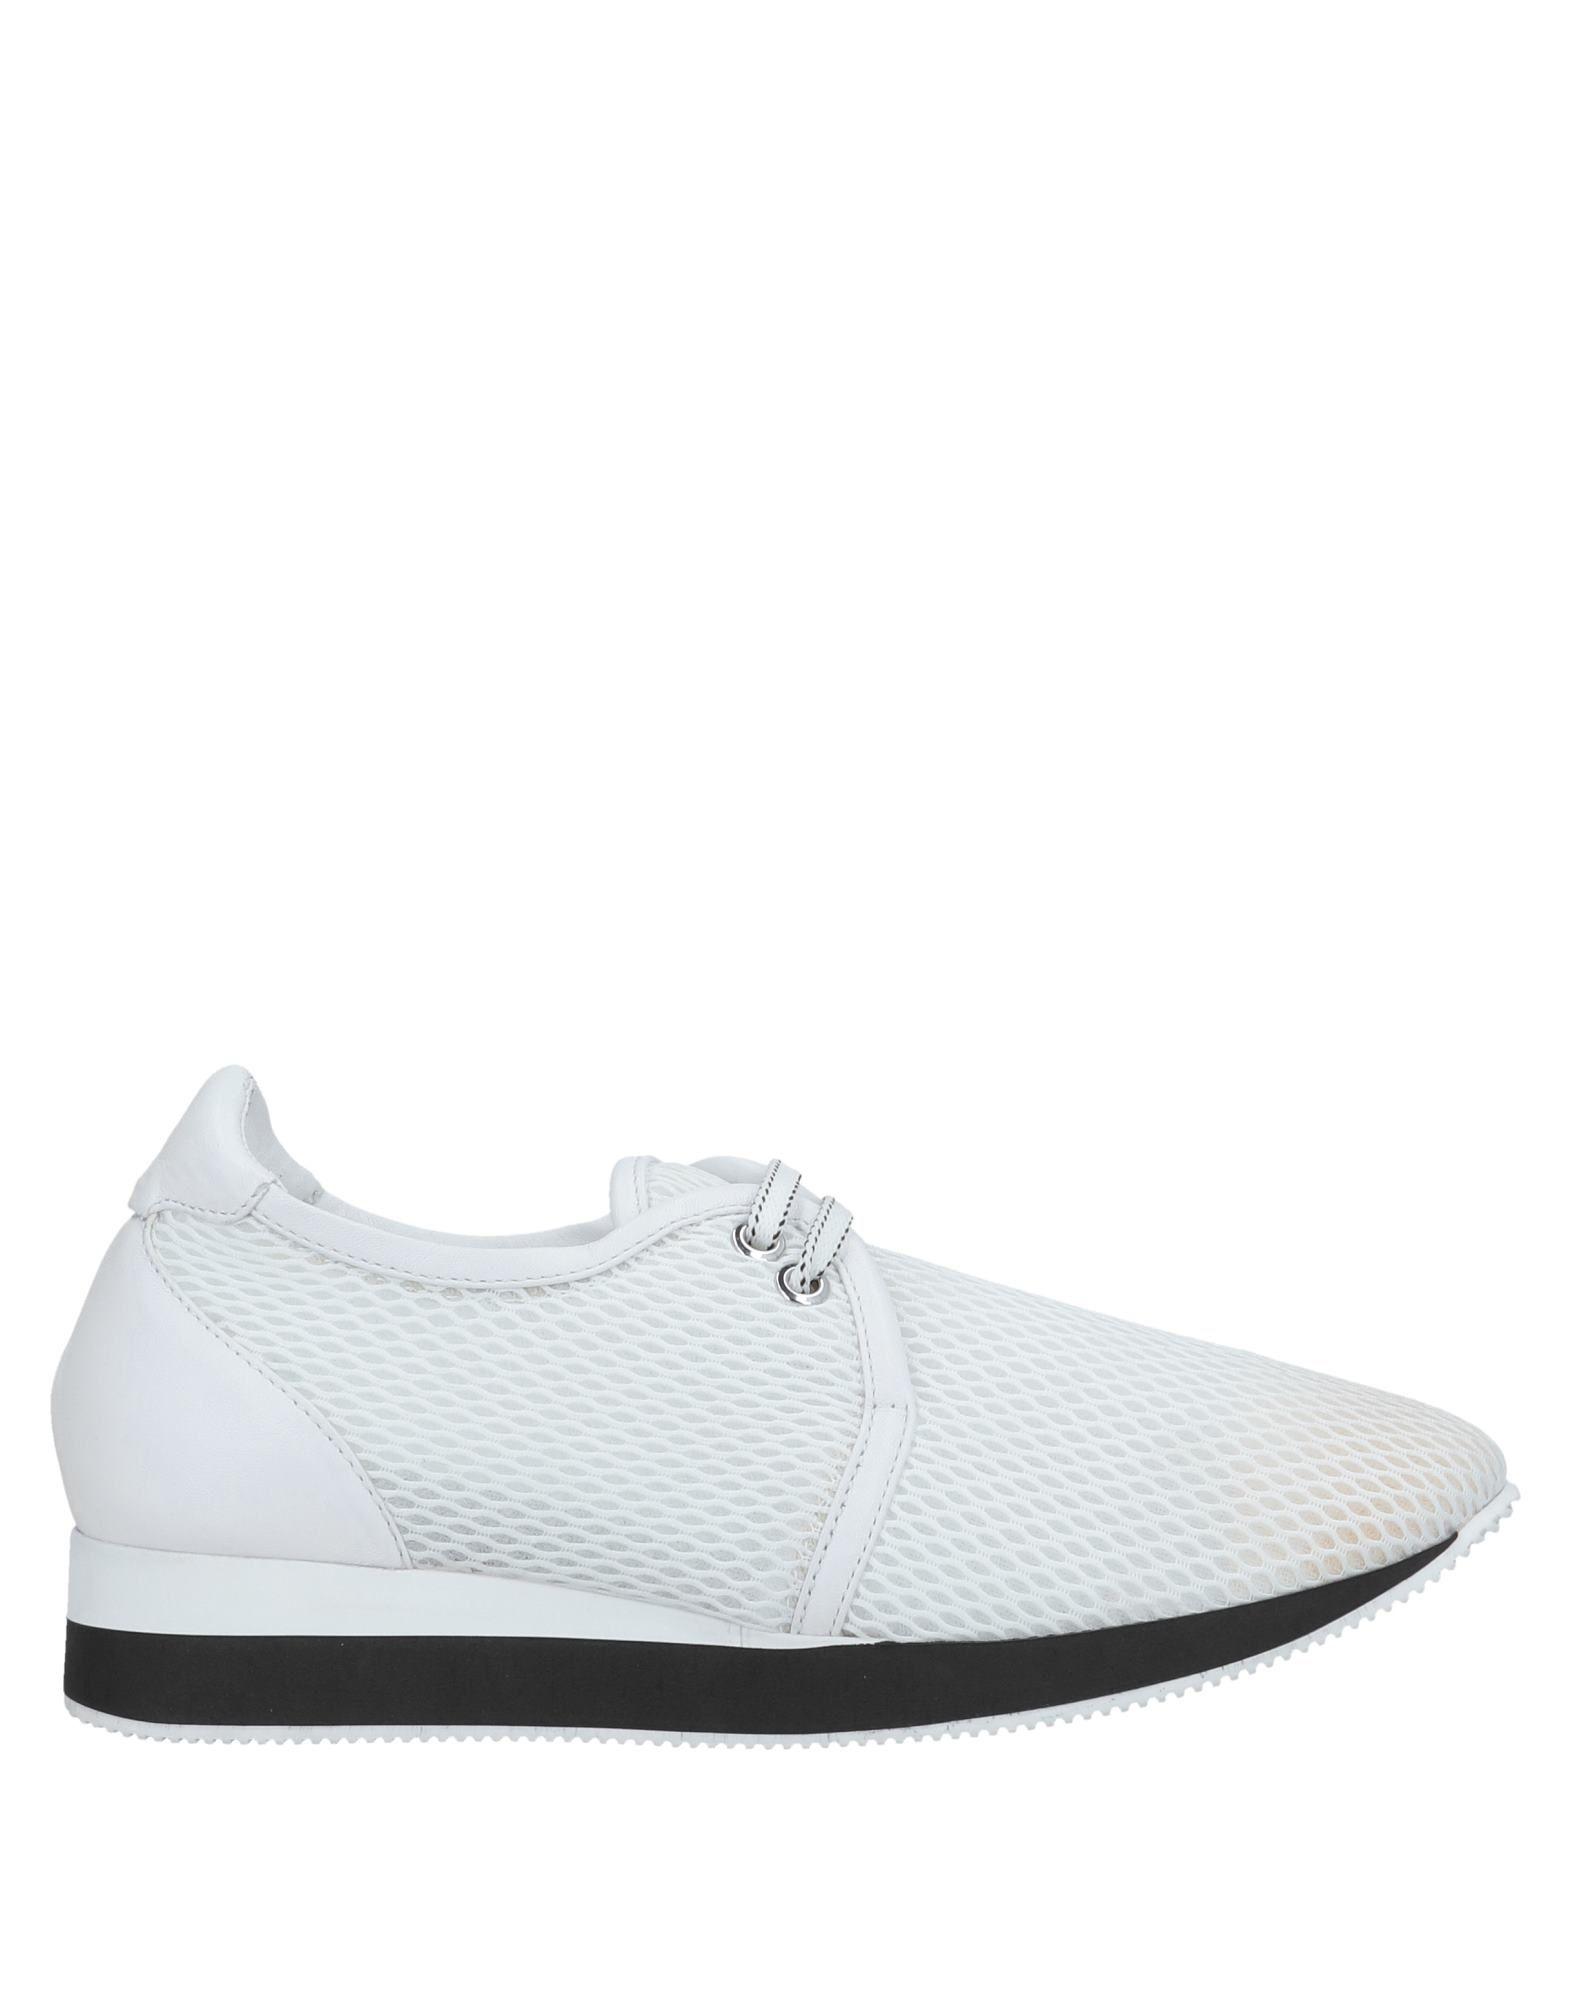 Sneakers Max Mara Donna - 11554937NR